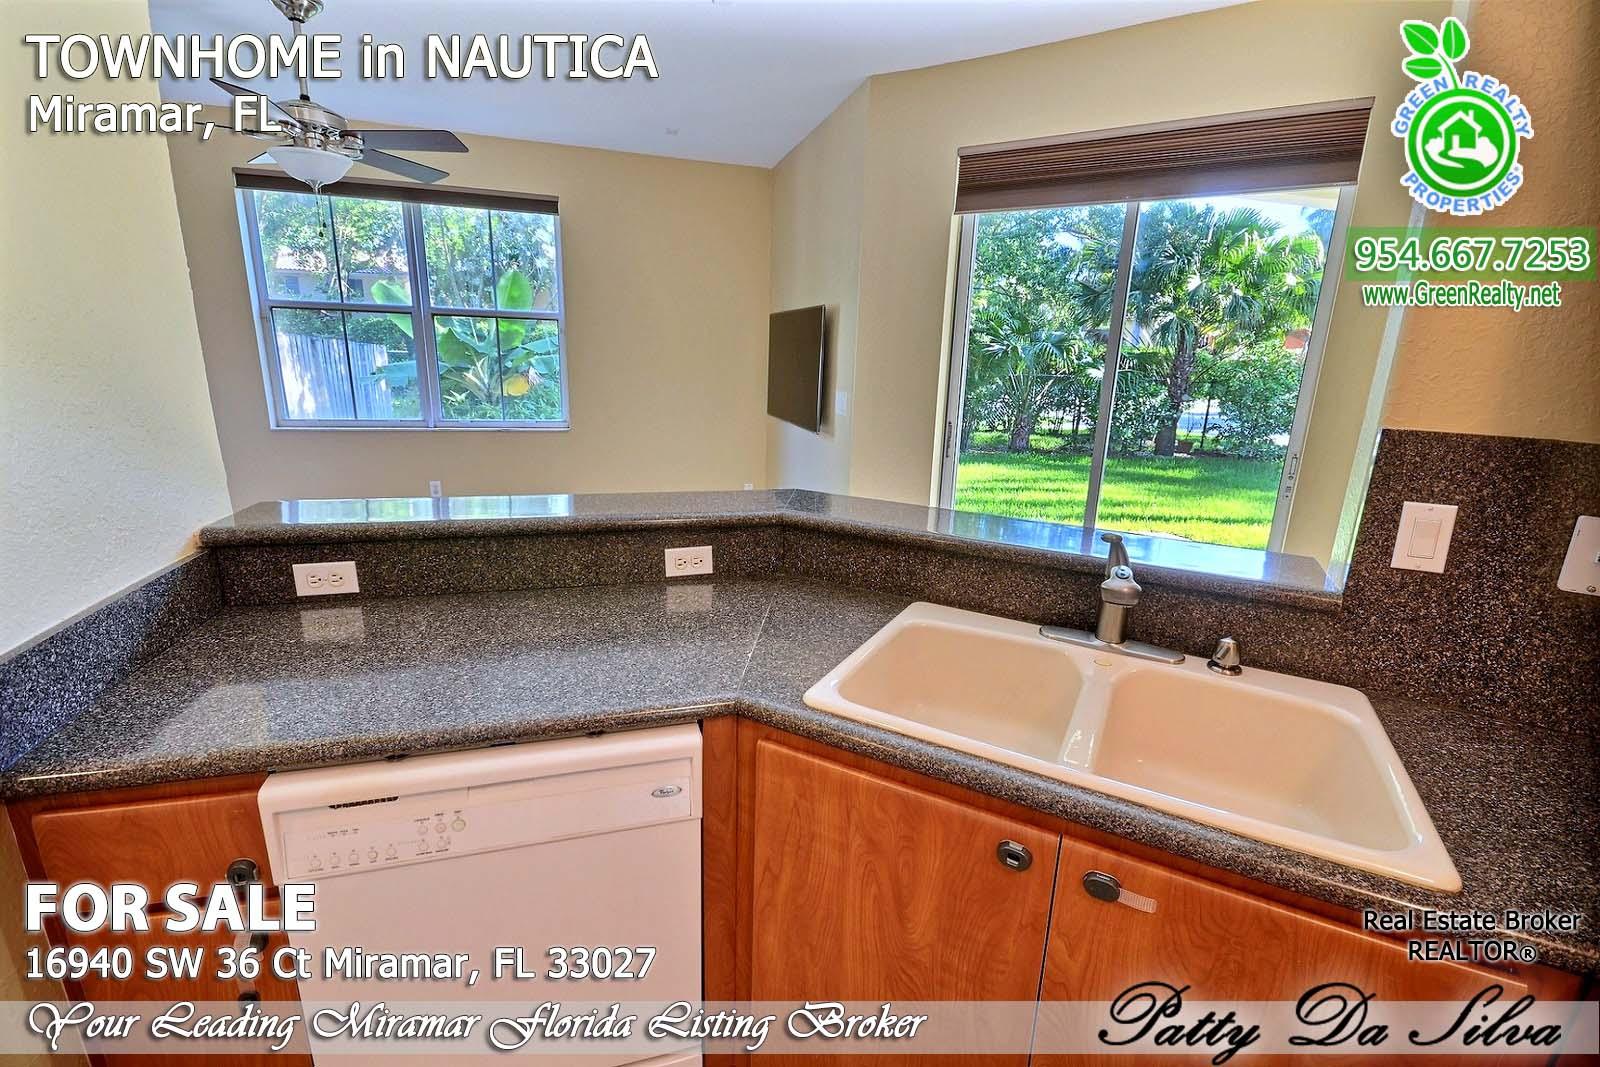 16940 SW 36 Ct Miramar, FL 33027 - Nautica Miramar Homes For Sale (17)